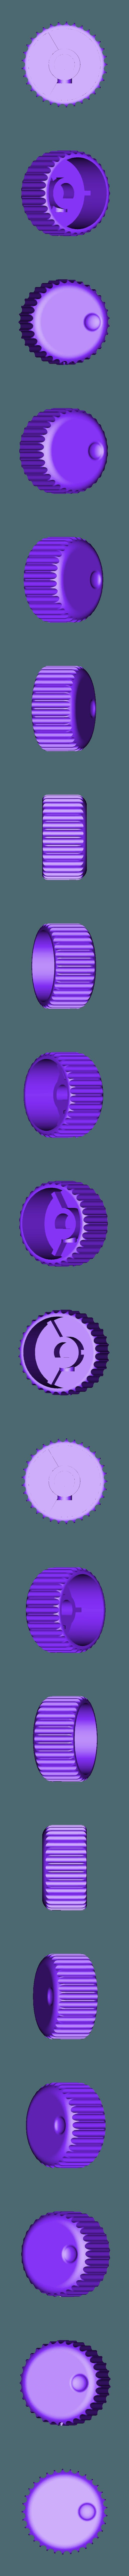 encoder.stl Download free STL file encoder • 3D printer object, Ruvimkub